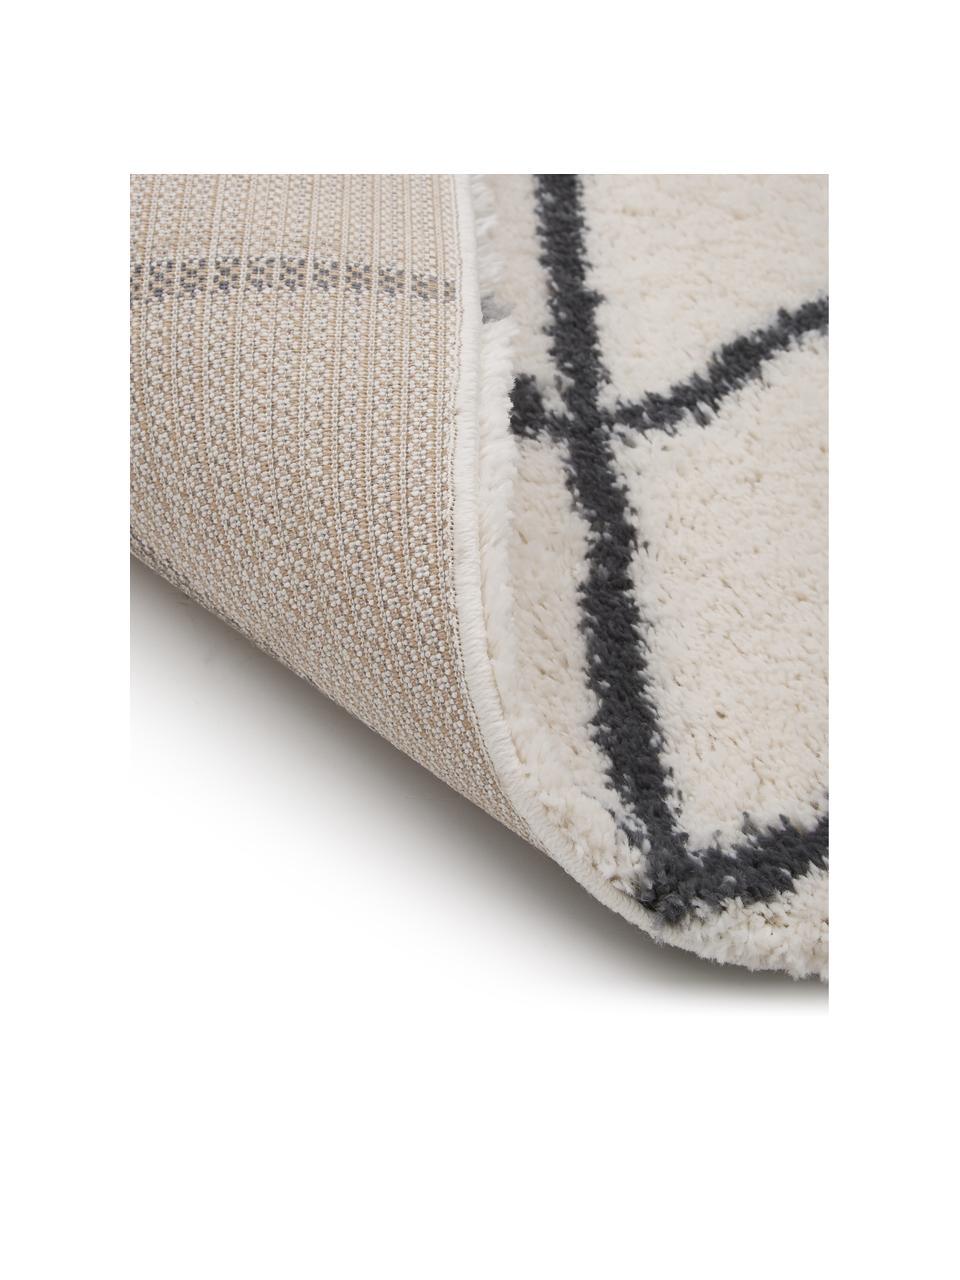 Passatoia a pelo lungo bianco crema/grigio scuro Cera, Retro: 78% juta, 14% cotone, 8% , Bianco crema, grigio scuro, Larg. 80 x Lung. 250 cm